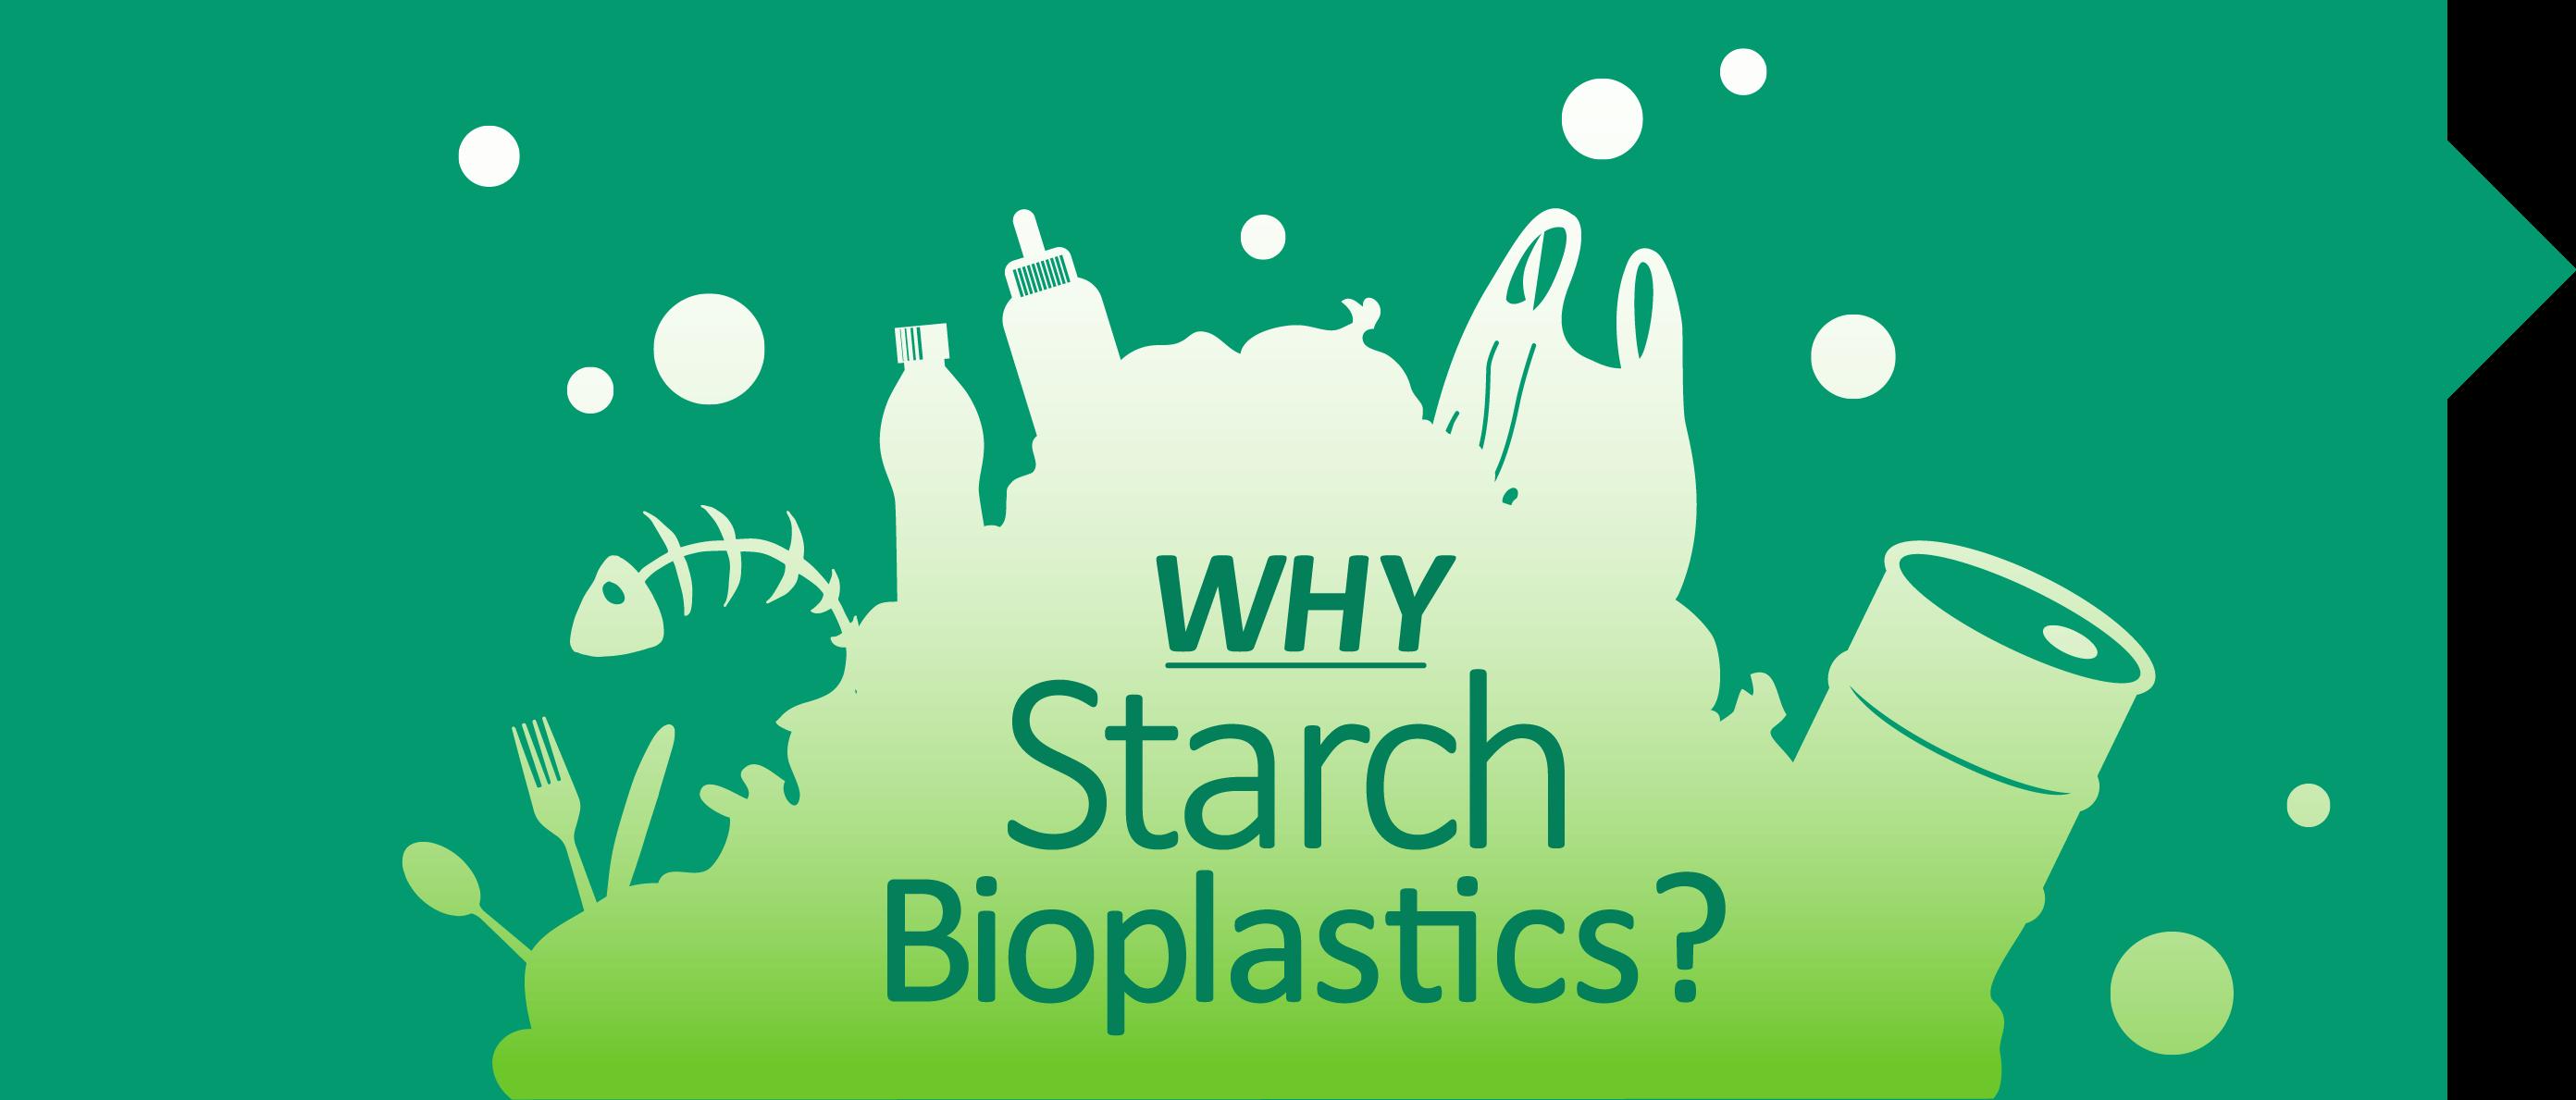 Why Starch Bioplastics